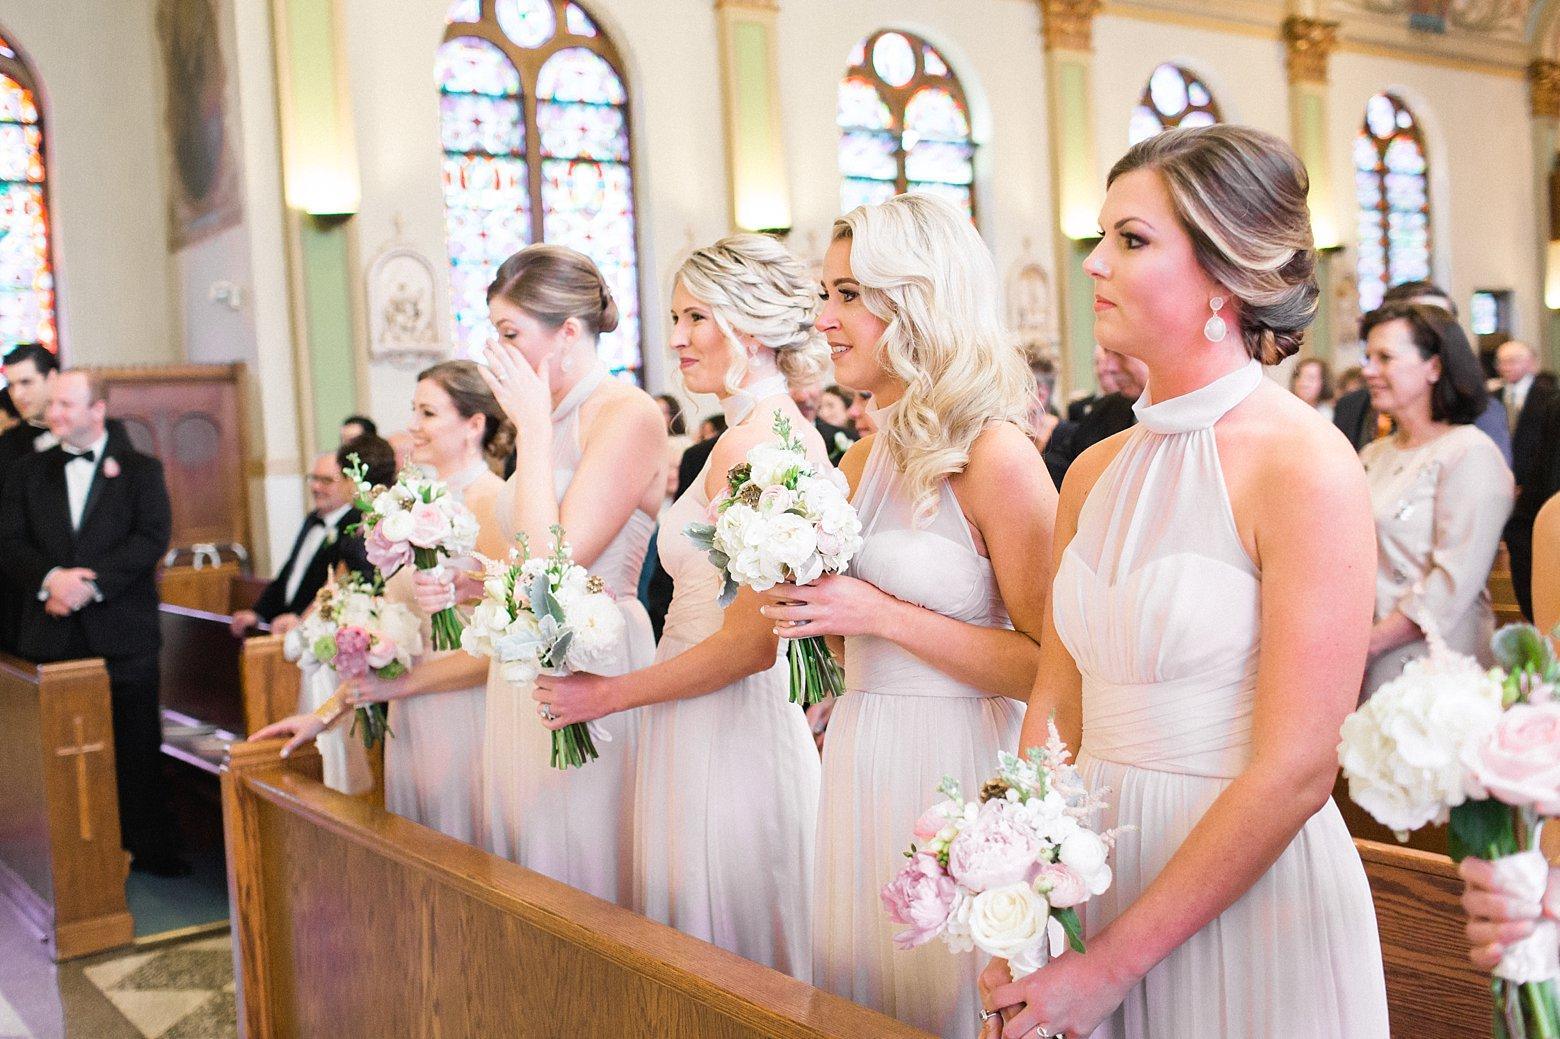 lauren_fair_photography_april_lynn_designs_stasia_matt_spring_cairnwood_estate_wedding_northeast_philadelphia_blush_pink_gold_wedding_invitation_stationery_0049